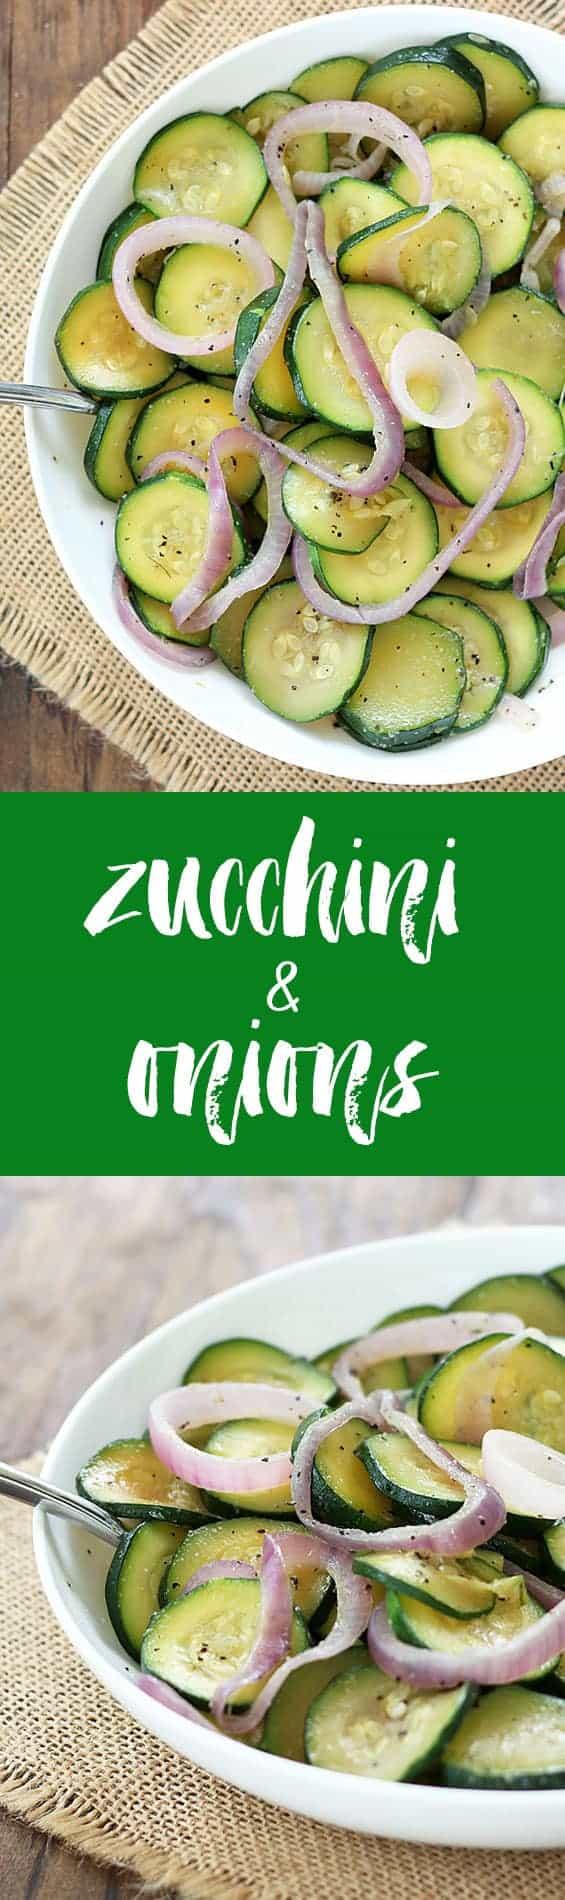 Zucchini & Onions | theblondcook.com